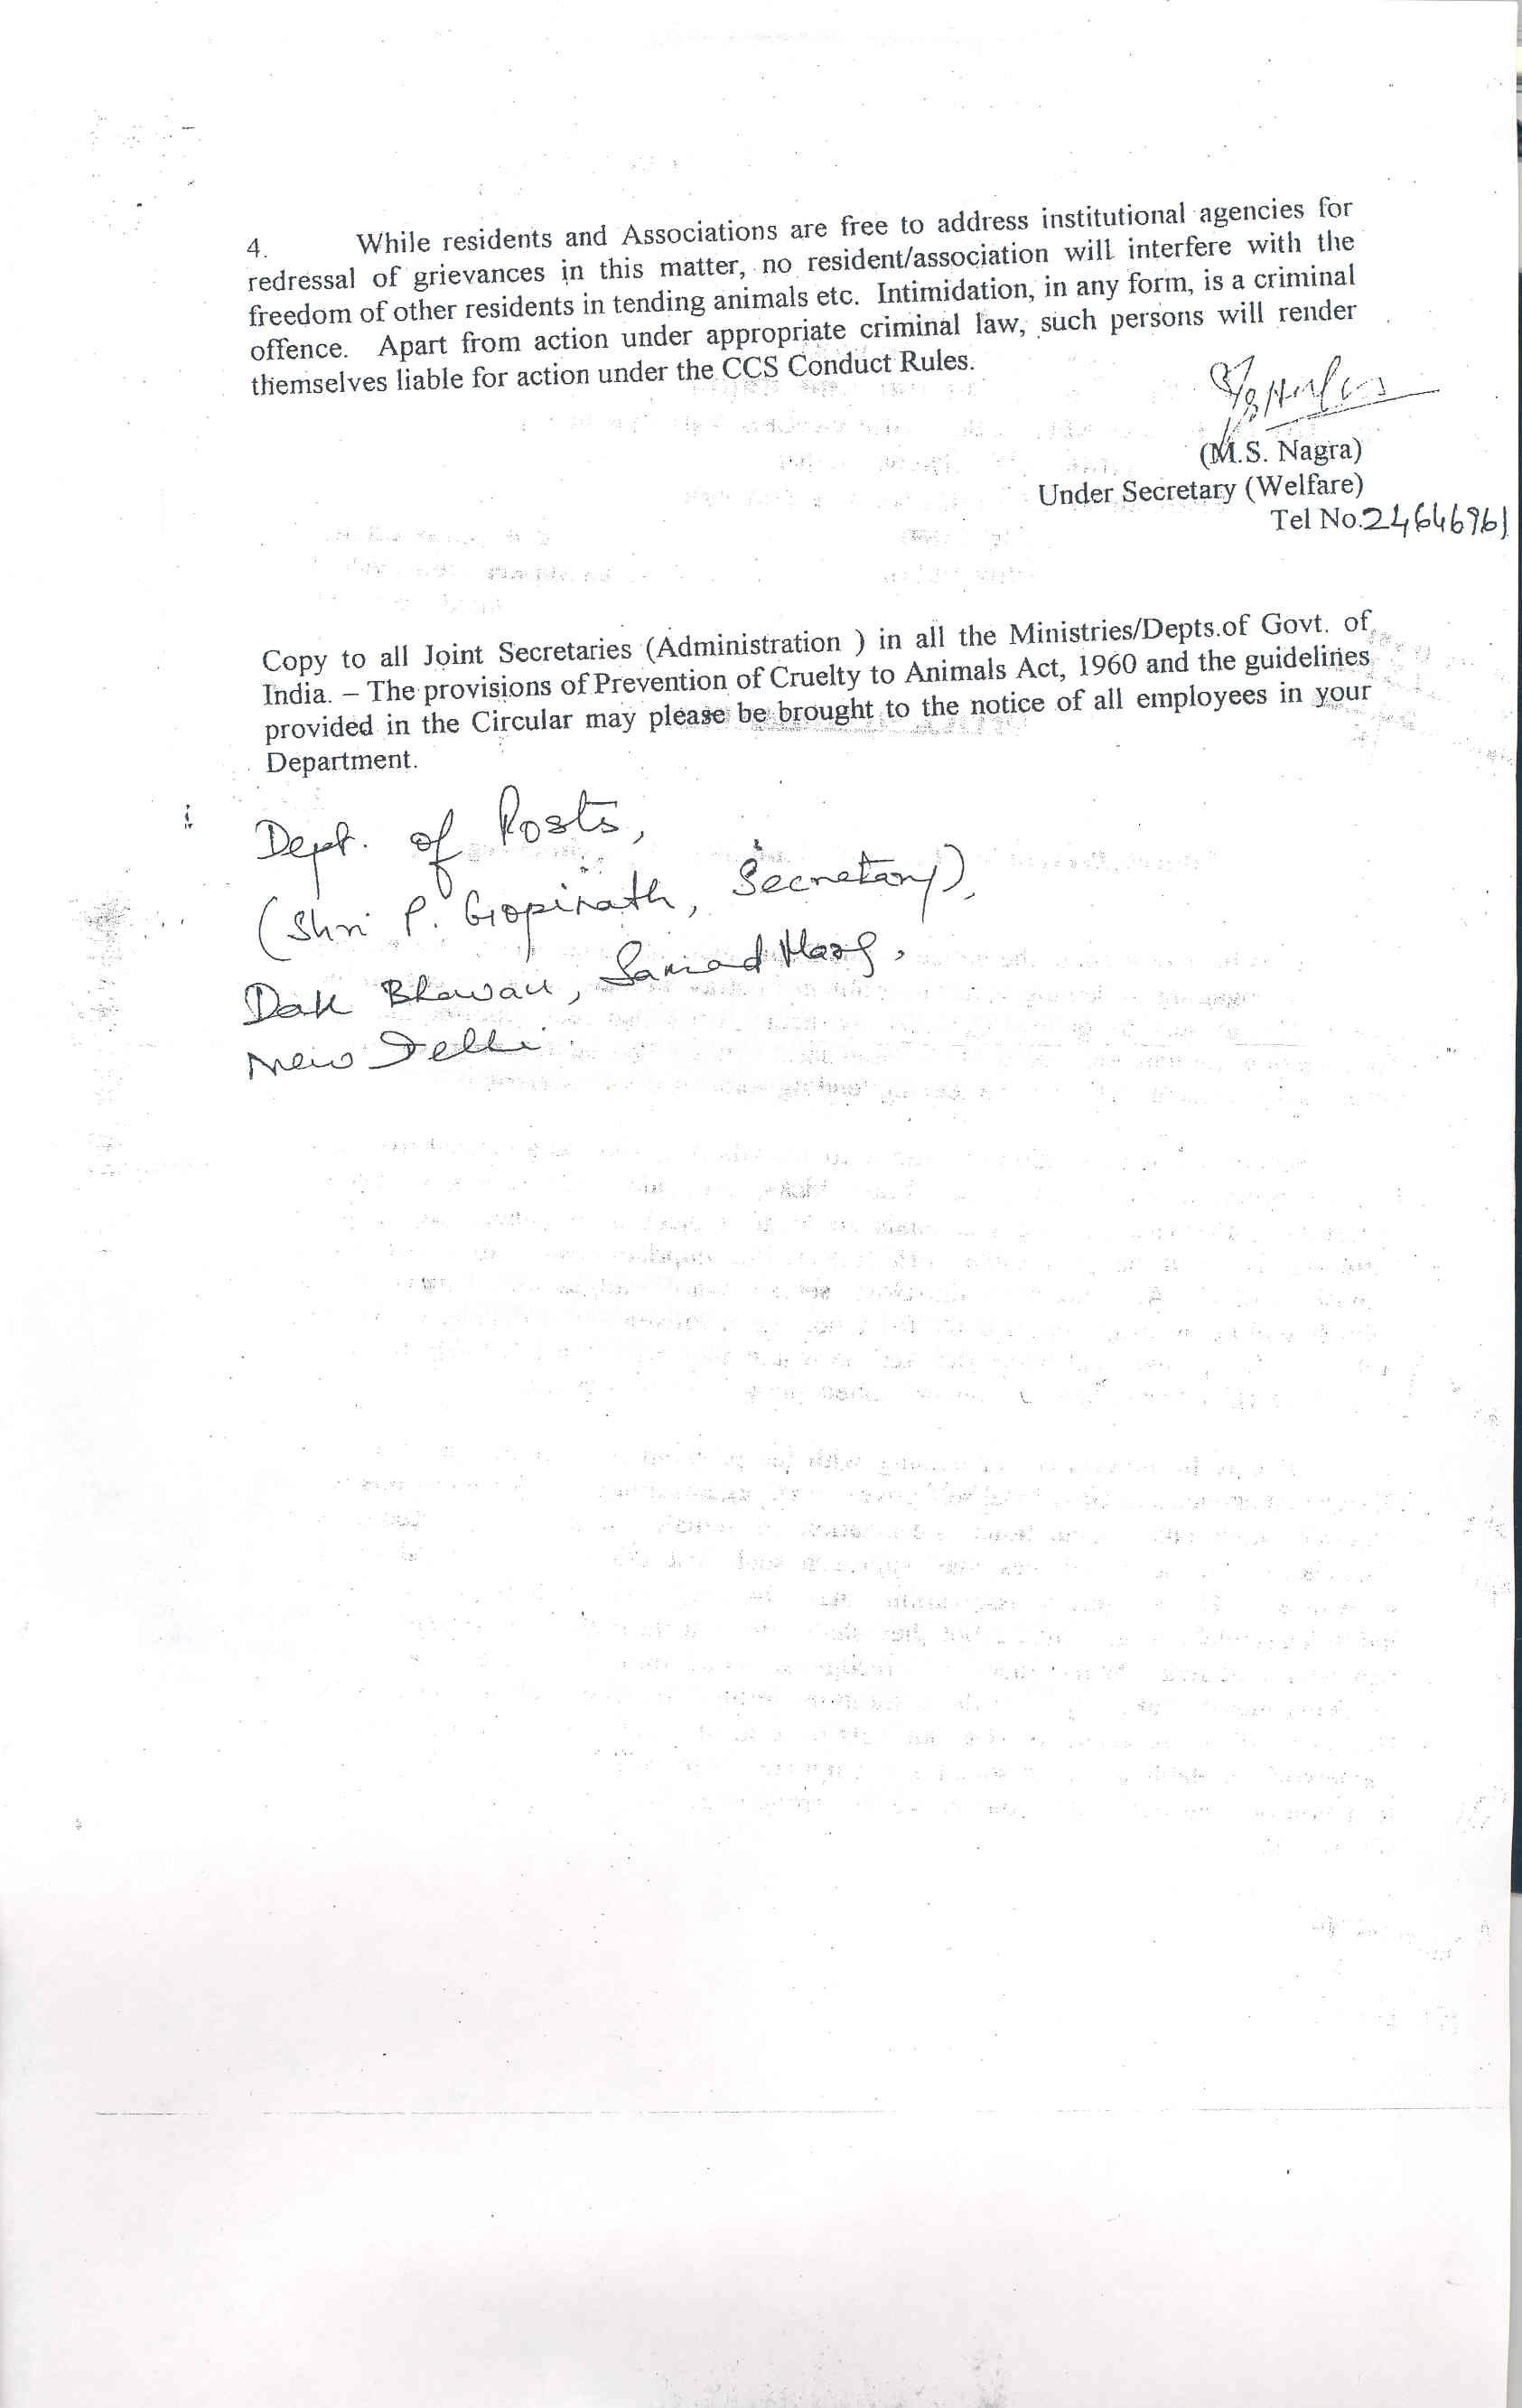 https://jaagrutiindia.files.wordpress.com/2010/04/public-grievances-circular-pg-2.jpg